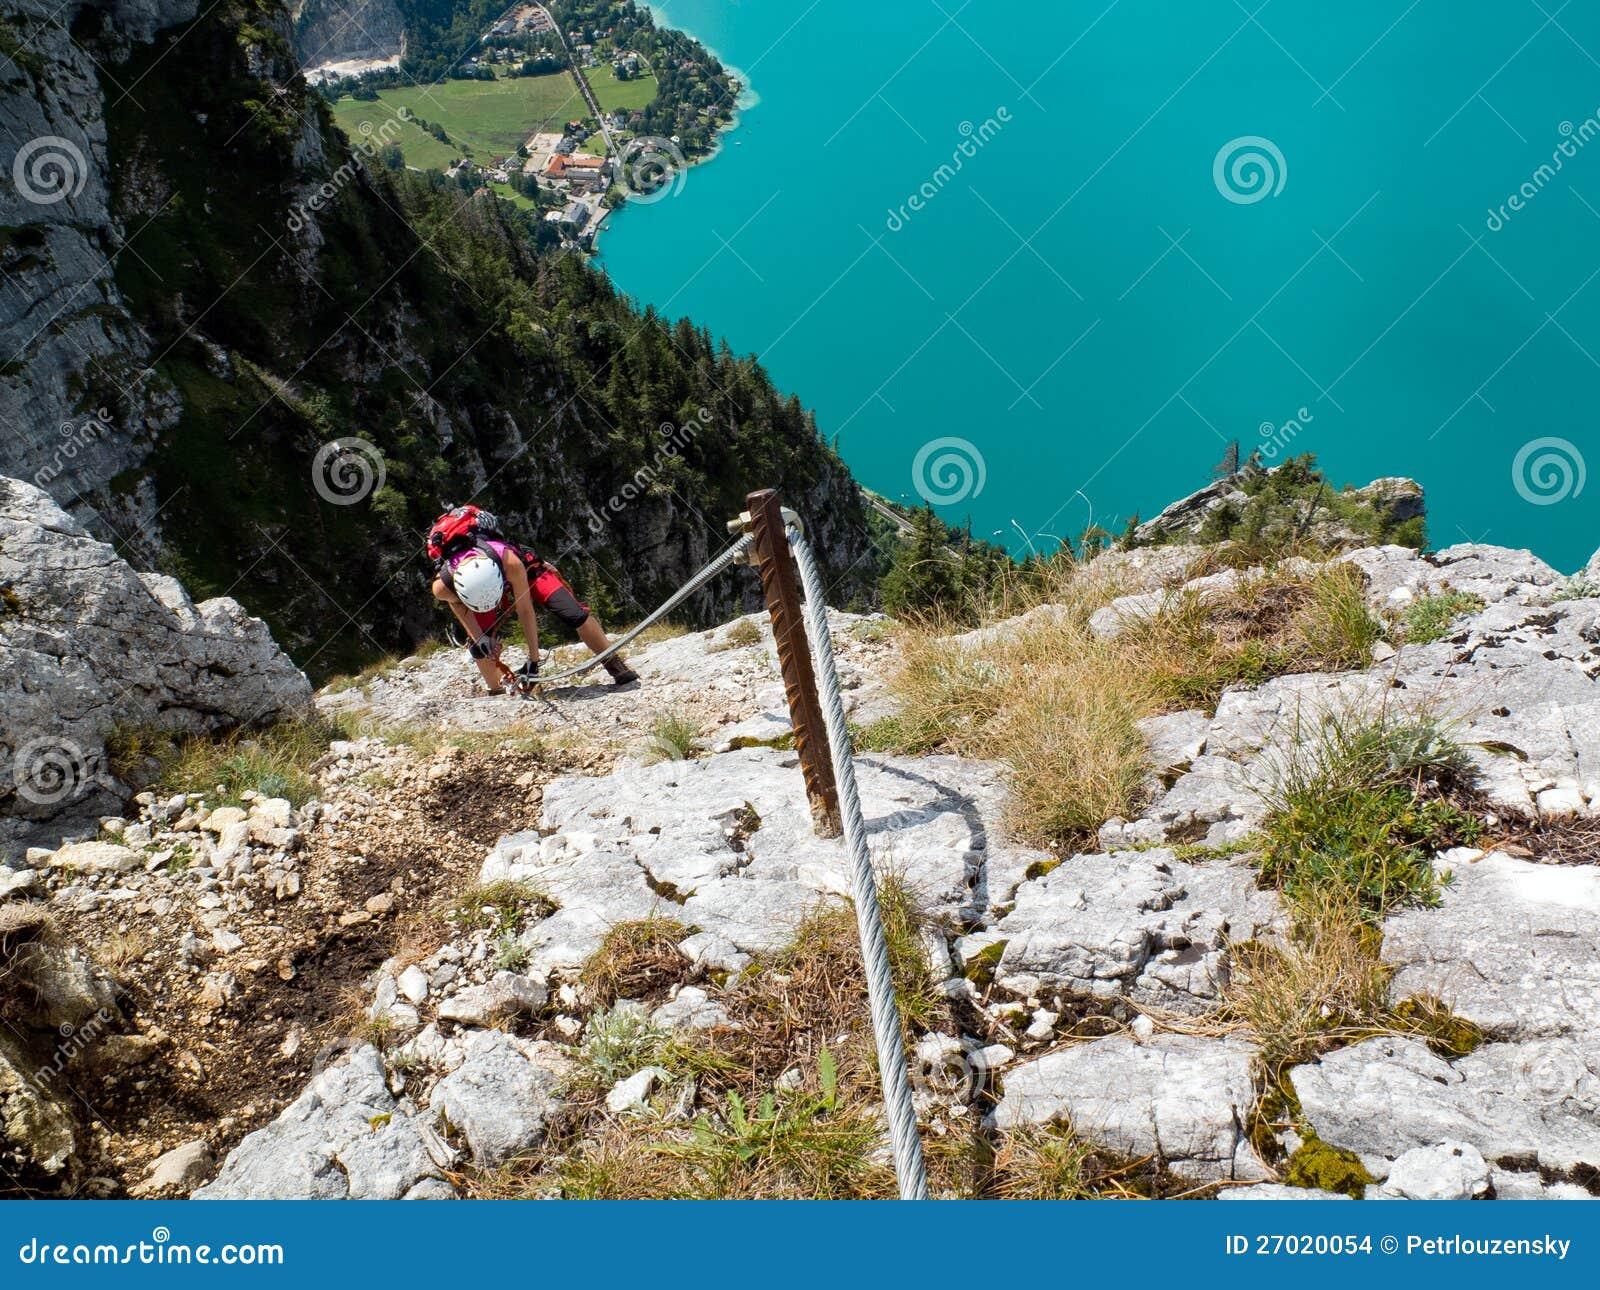 Klettersteig De : Klettersteig mit kindern bergtour online